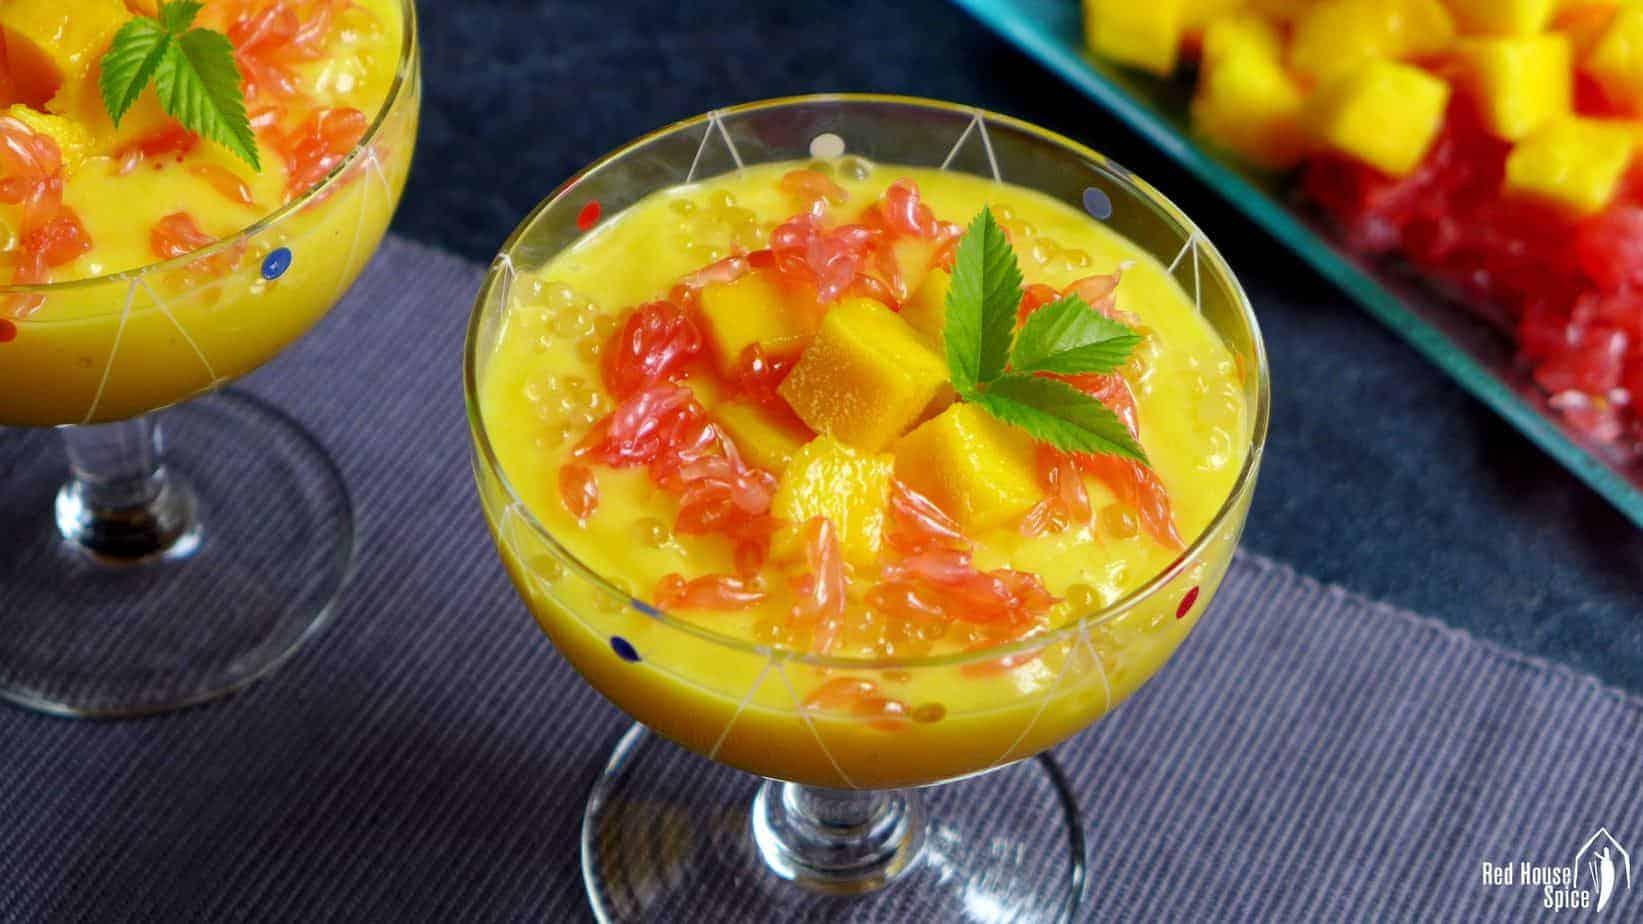 Mango sago with grapefruit (杨枝甘露)